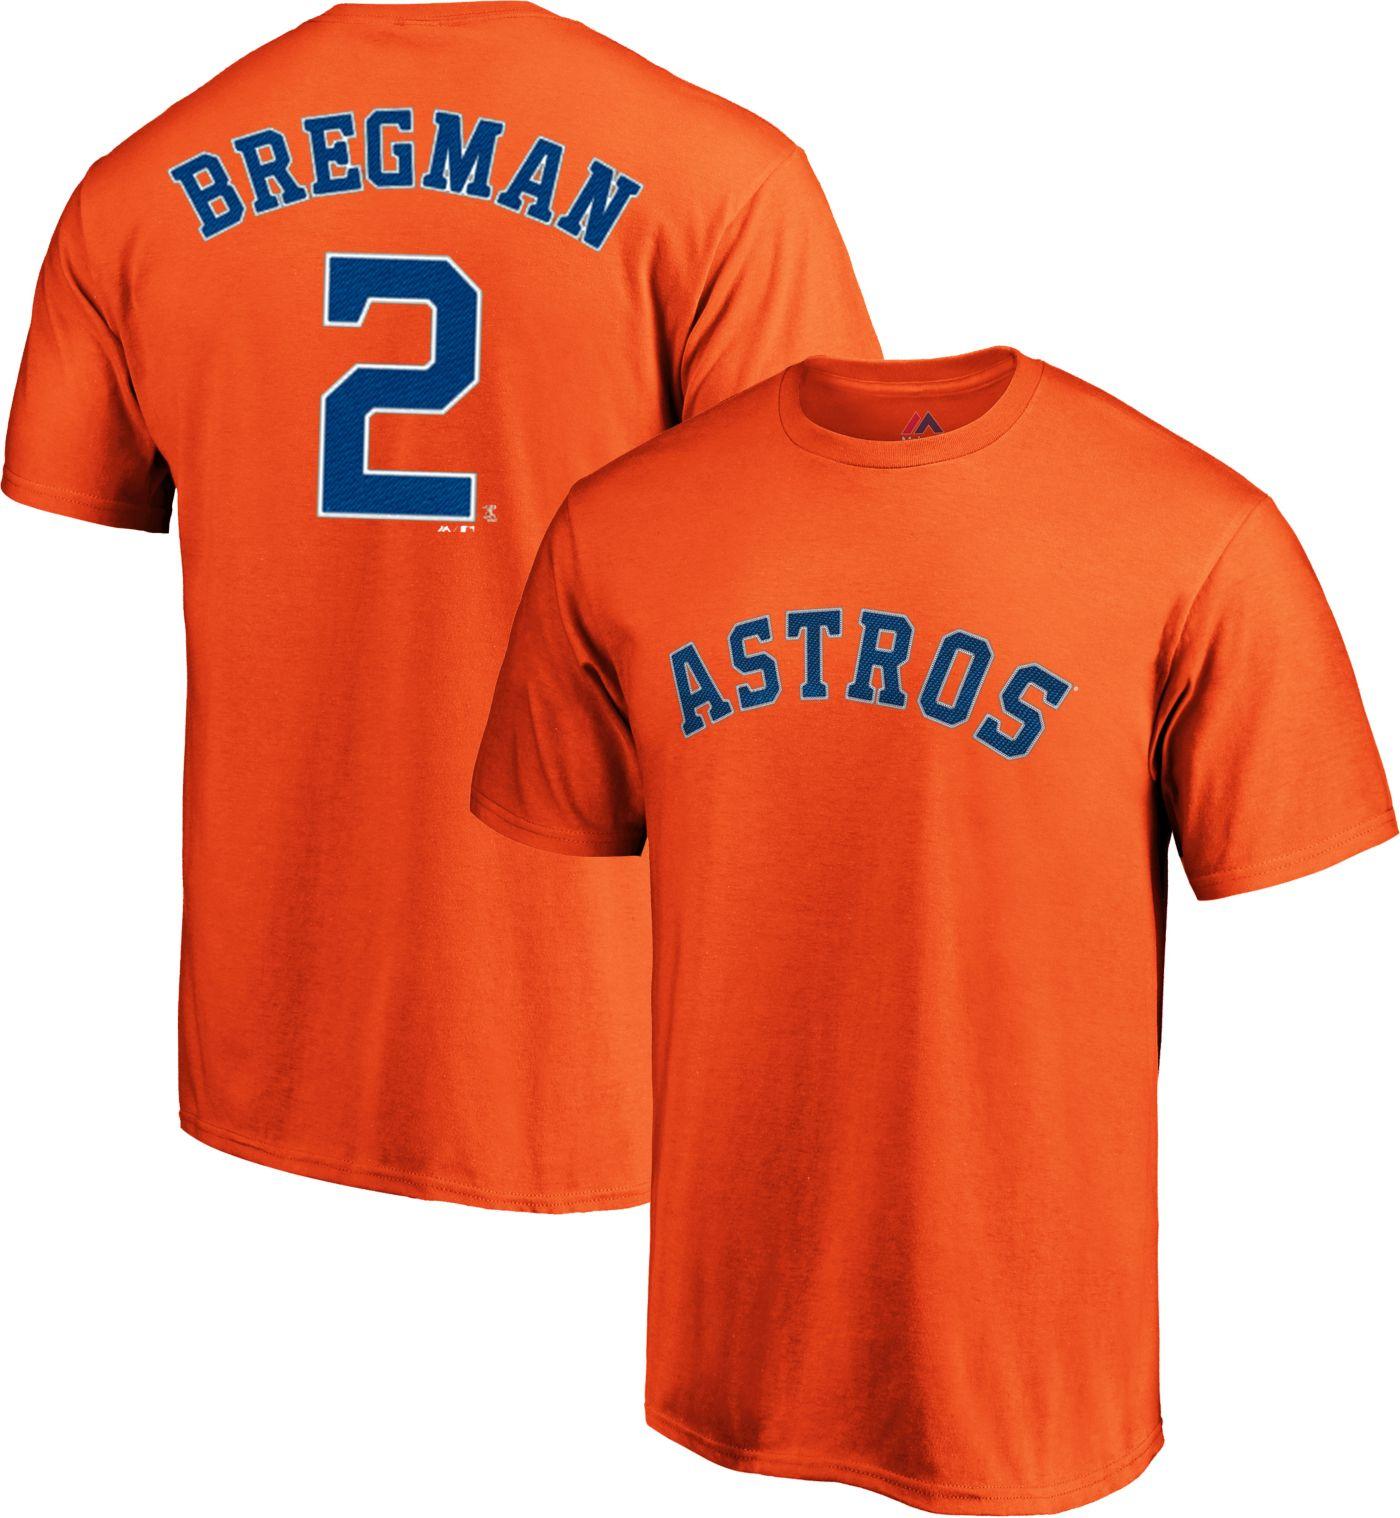 Majestic Men's Houston Astros Alex Bregman #2 Orange T-Shirt